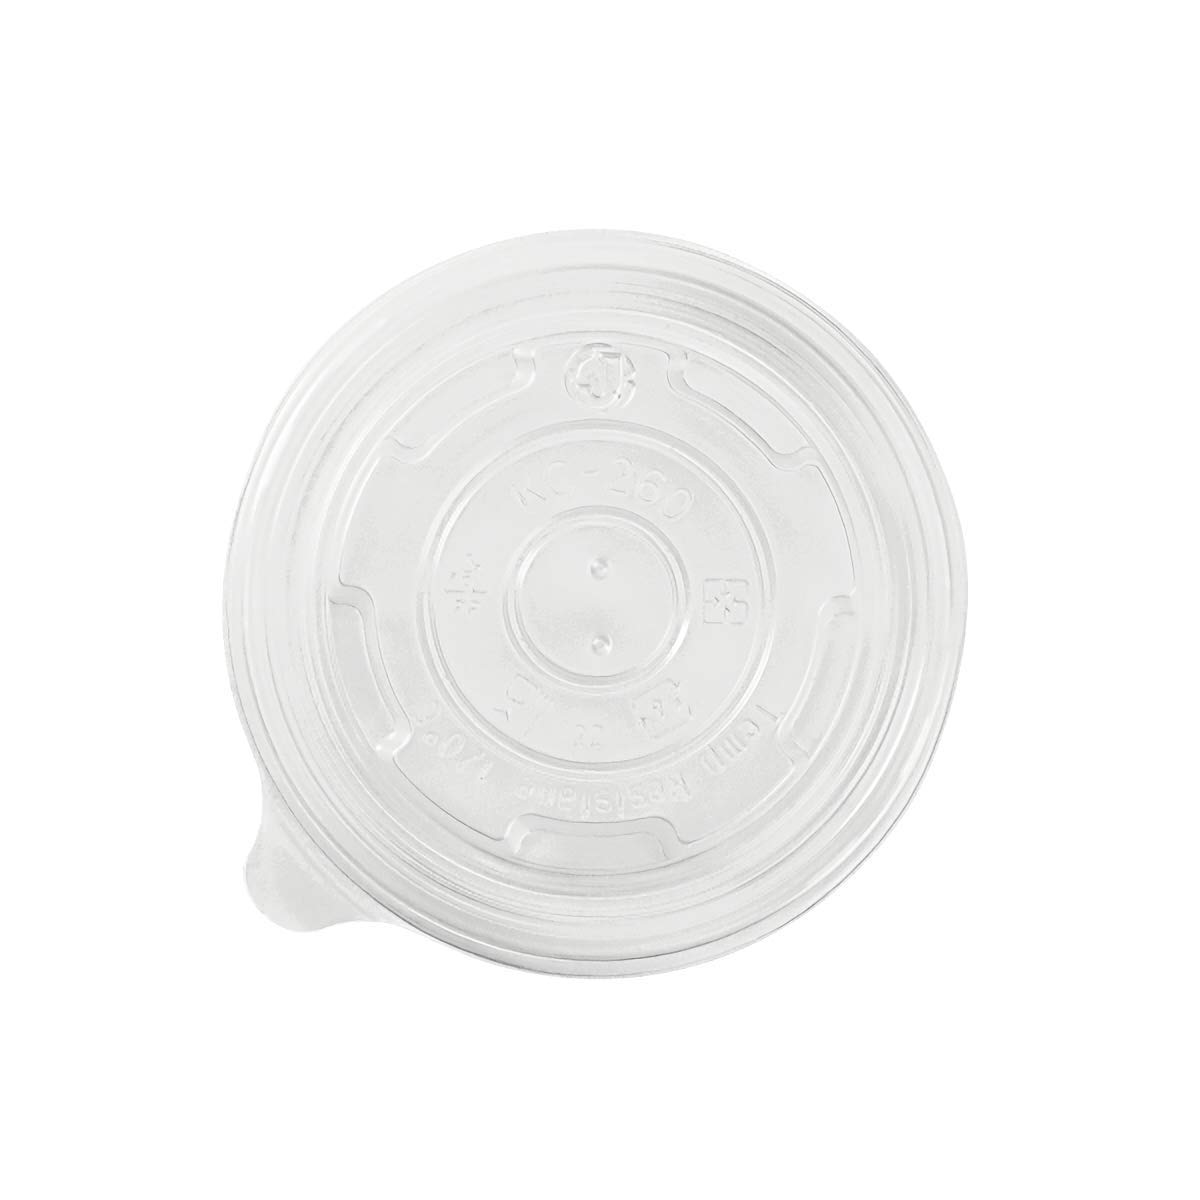 Karat C-KDL95-PP 8 oz PP Food Container Flat Lids (Case of 1000)